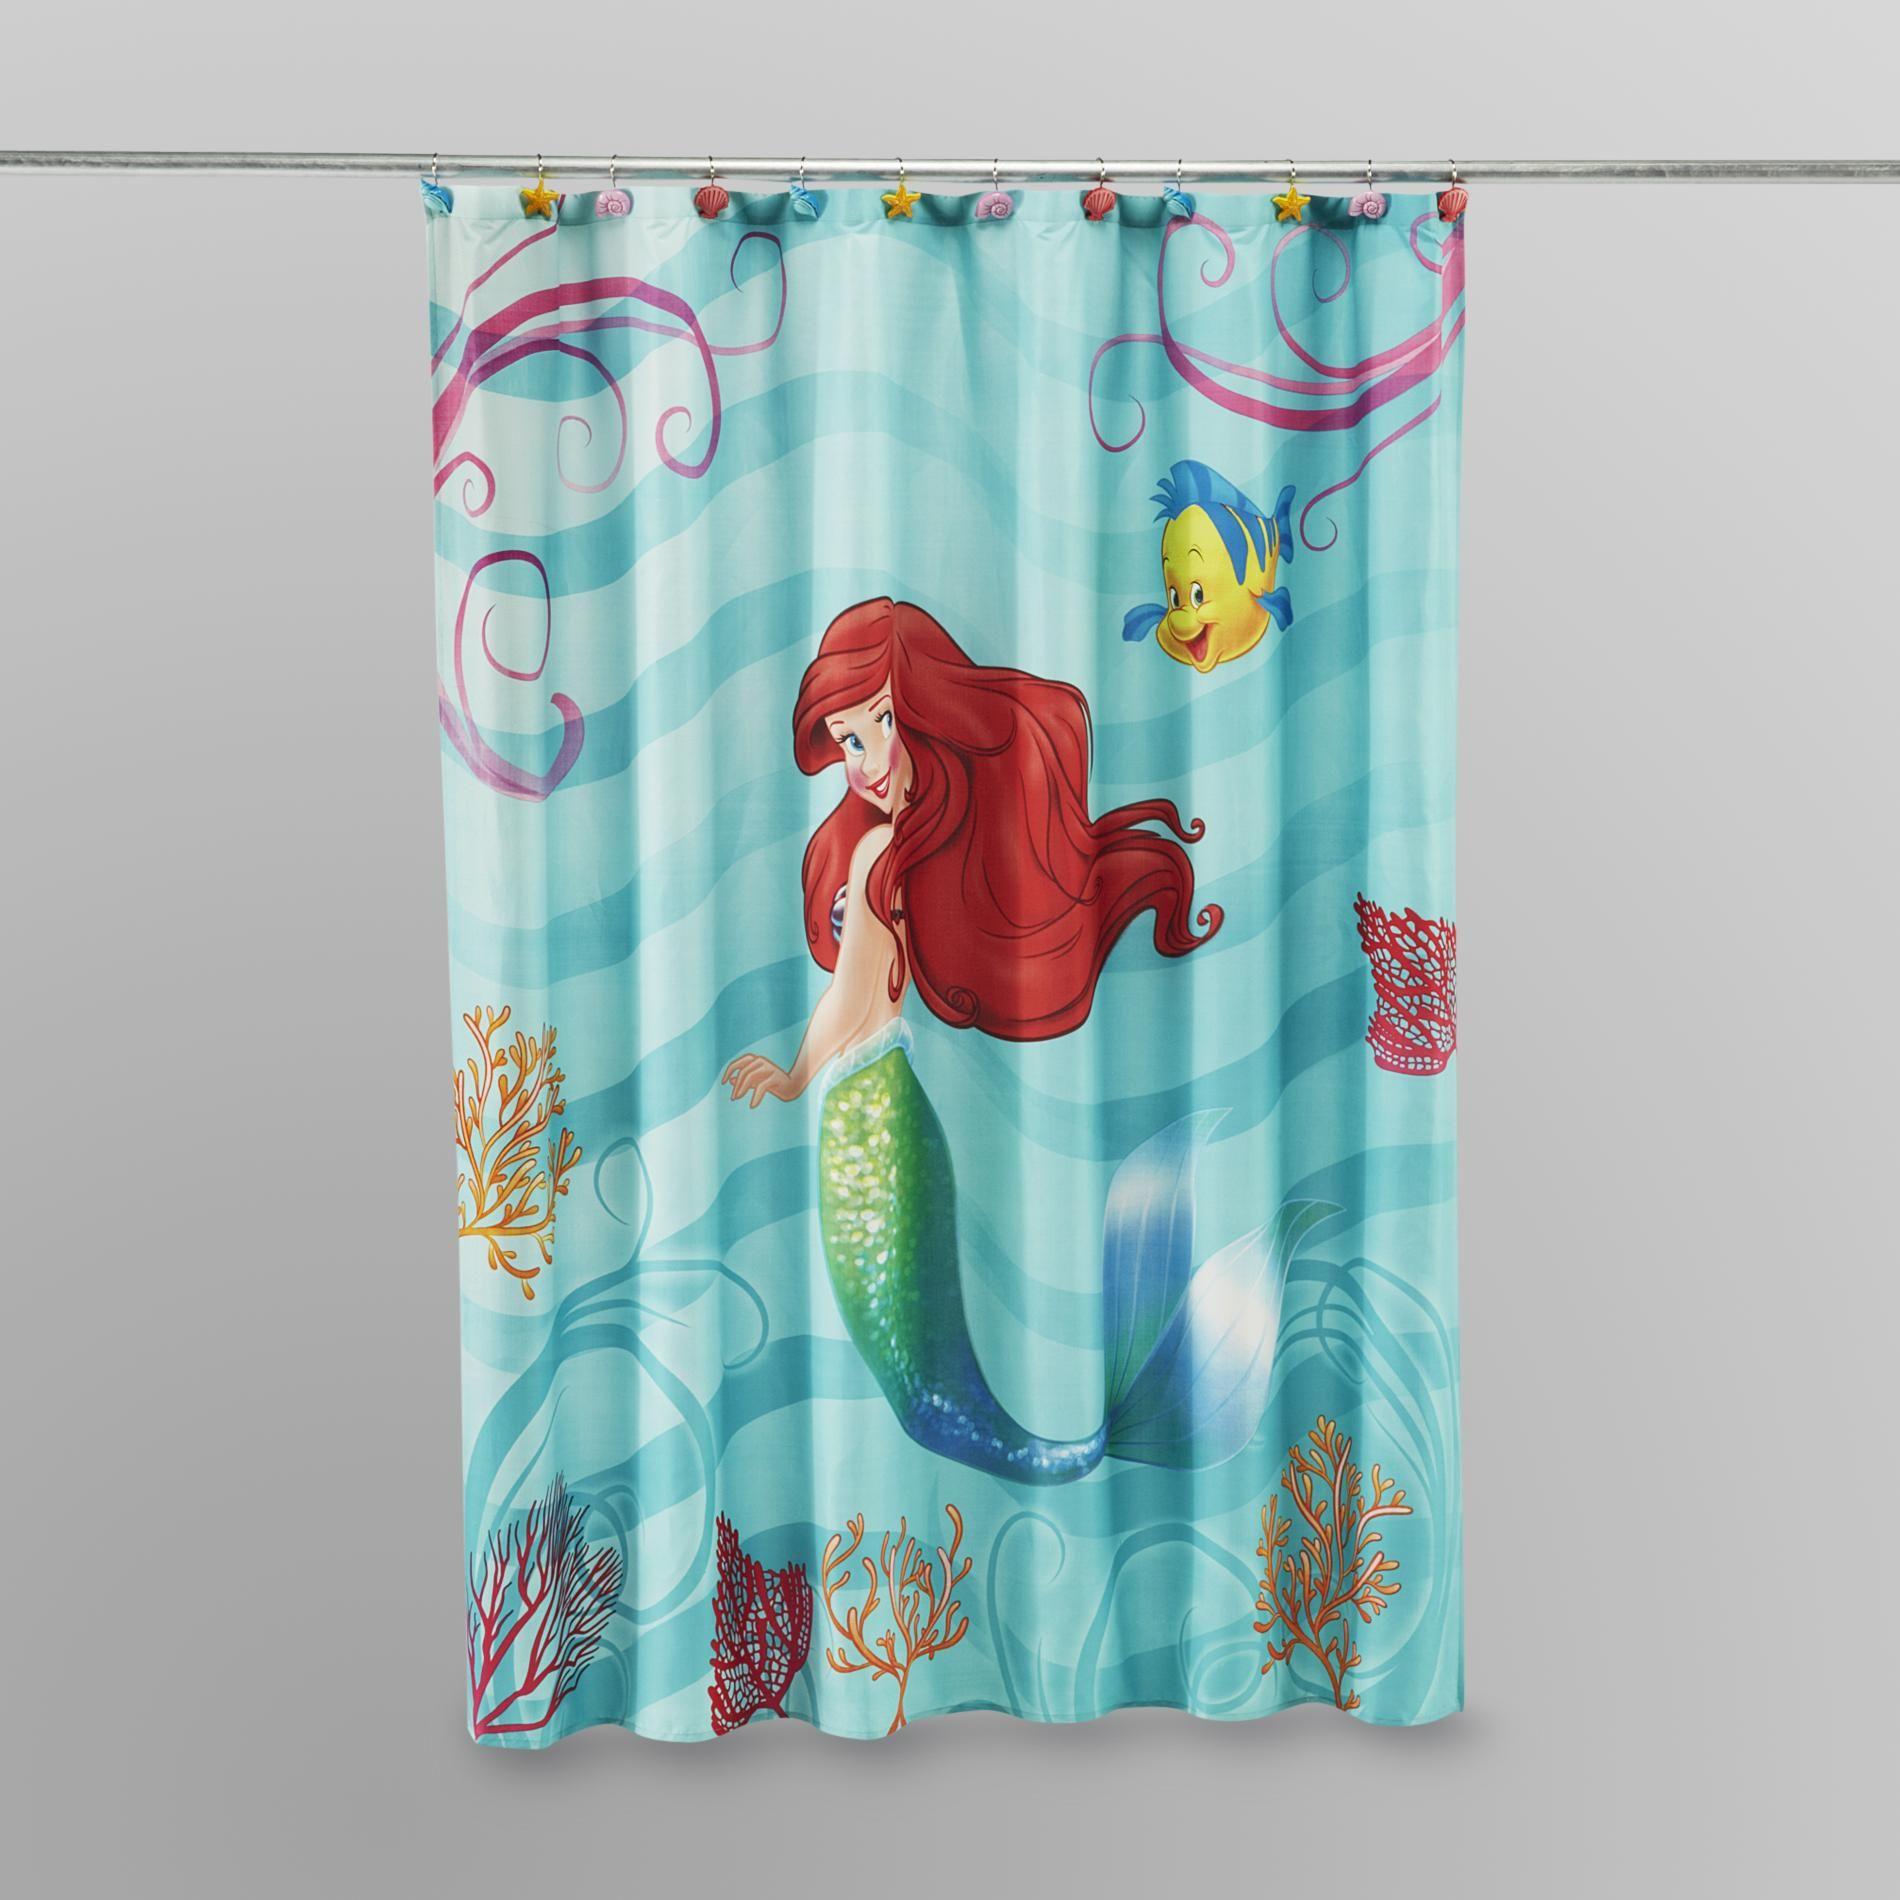 Sears Ariel Little Mermaid Bath Collection Disney Melissa Carter